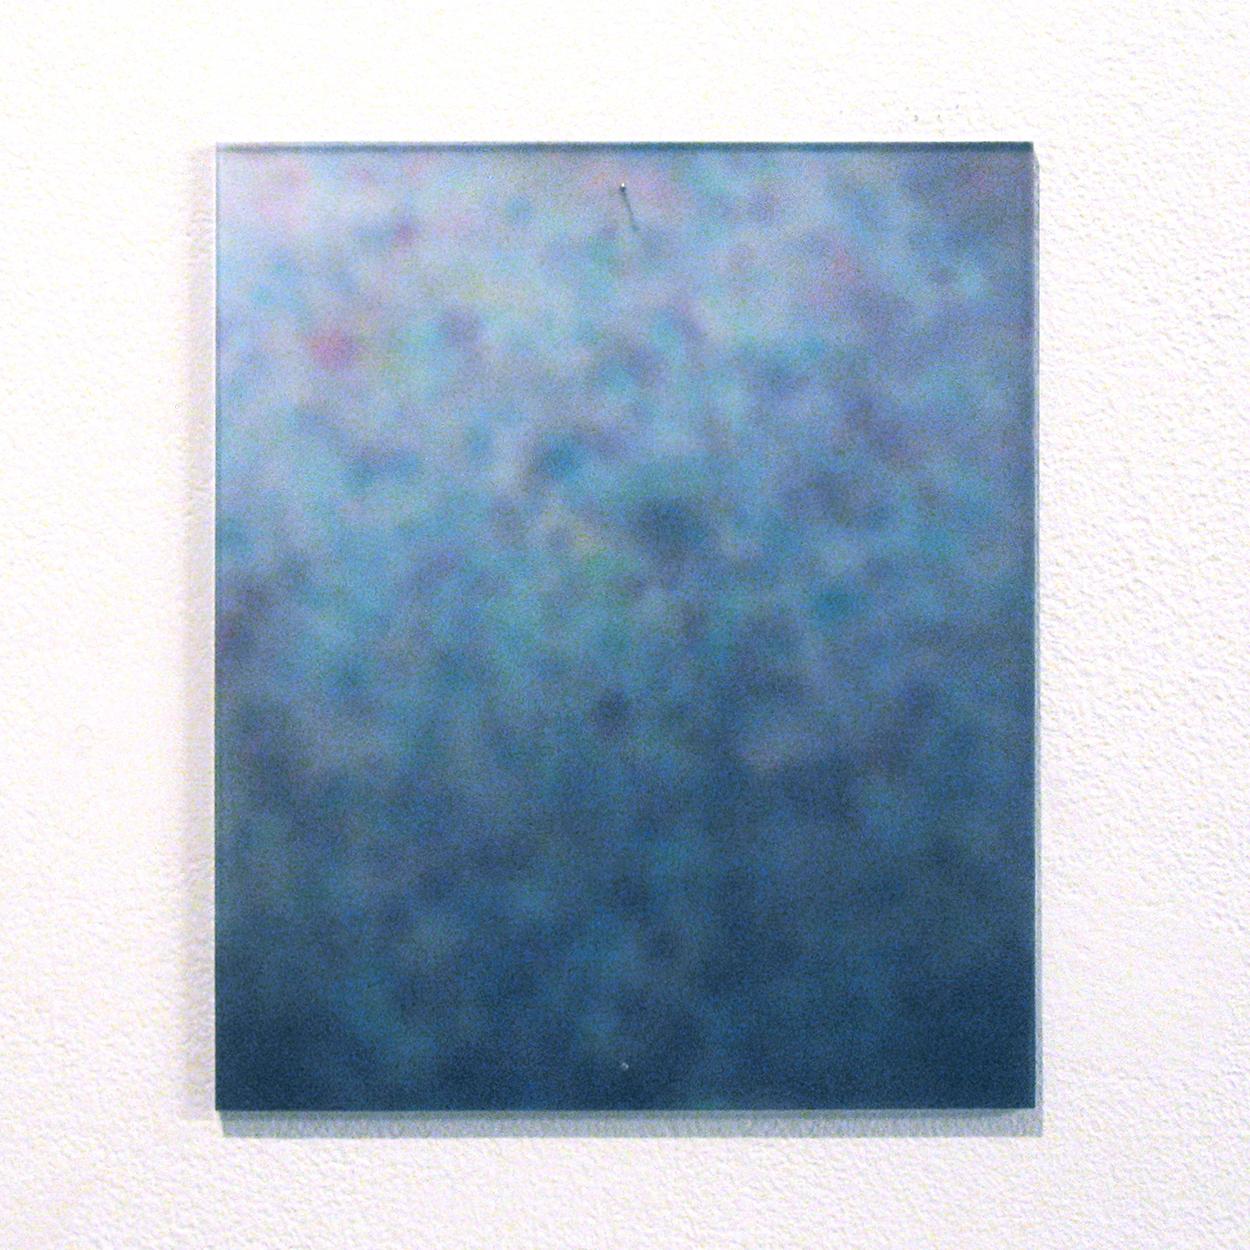 Light / Color|silkscreen on acrylic fiber plate|200 x 170 x 5 mm|2010